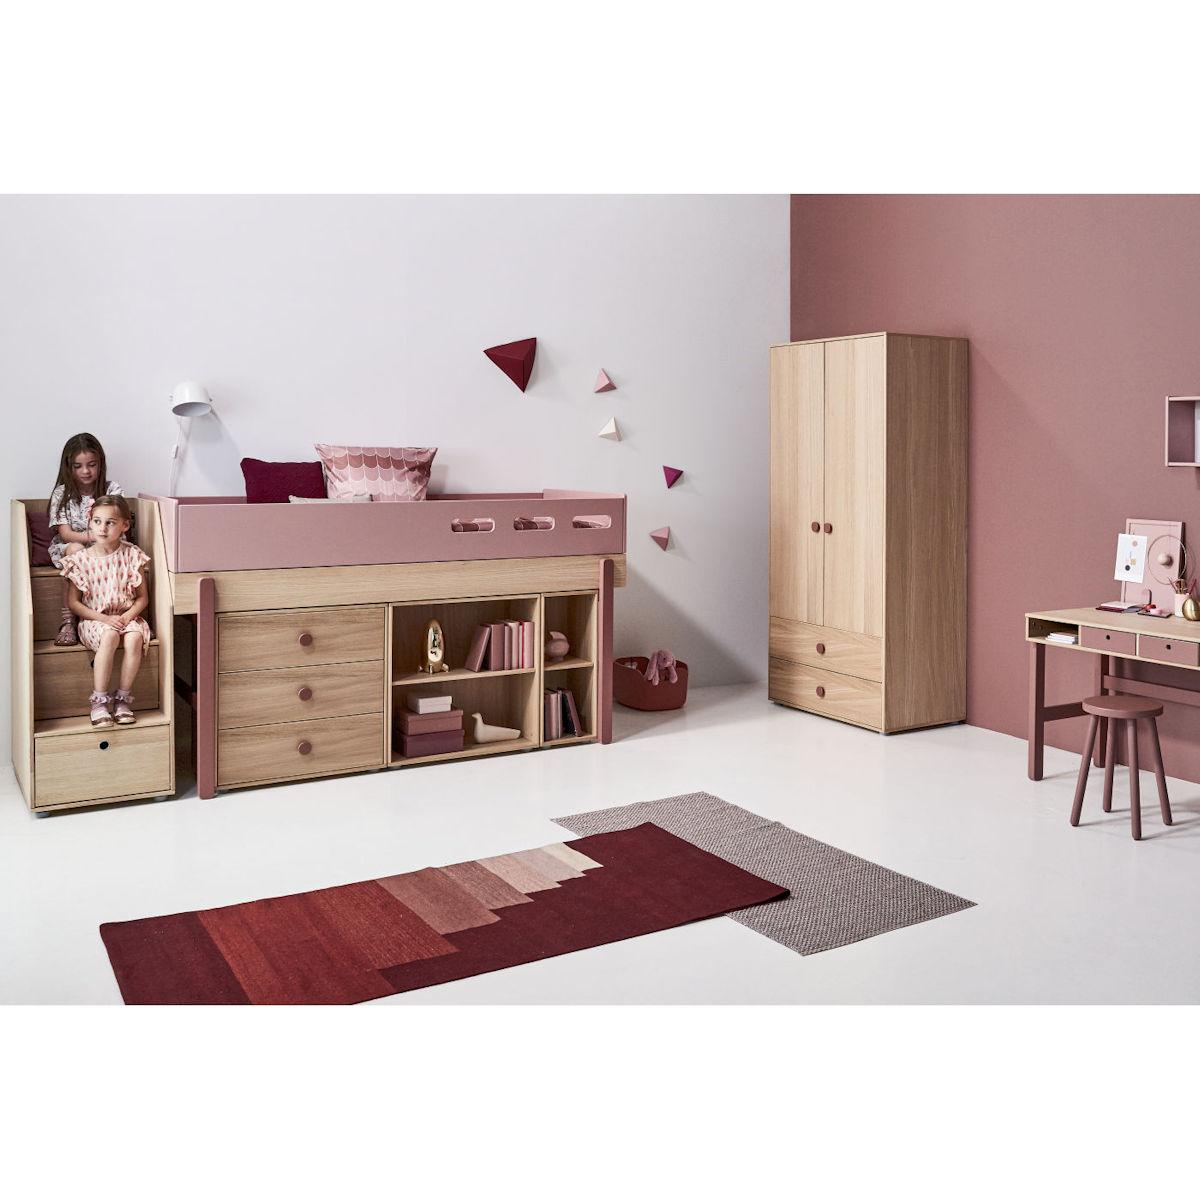 flexa popsicle halbhohes bett 90x200 cherry 90 10765 33. Black Bedroom Furniture Sets. Home Design Ideas